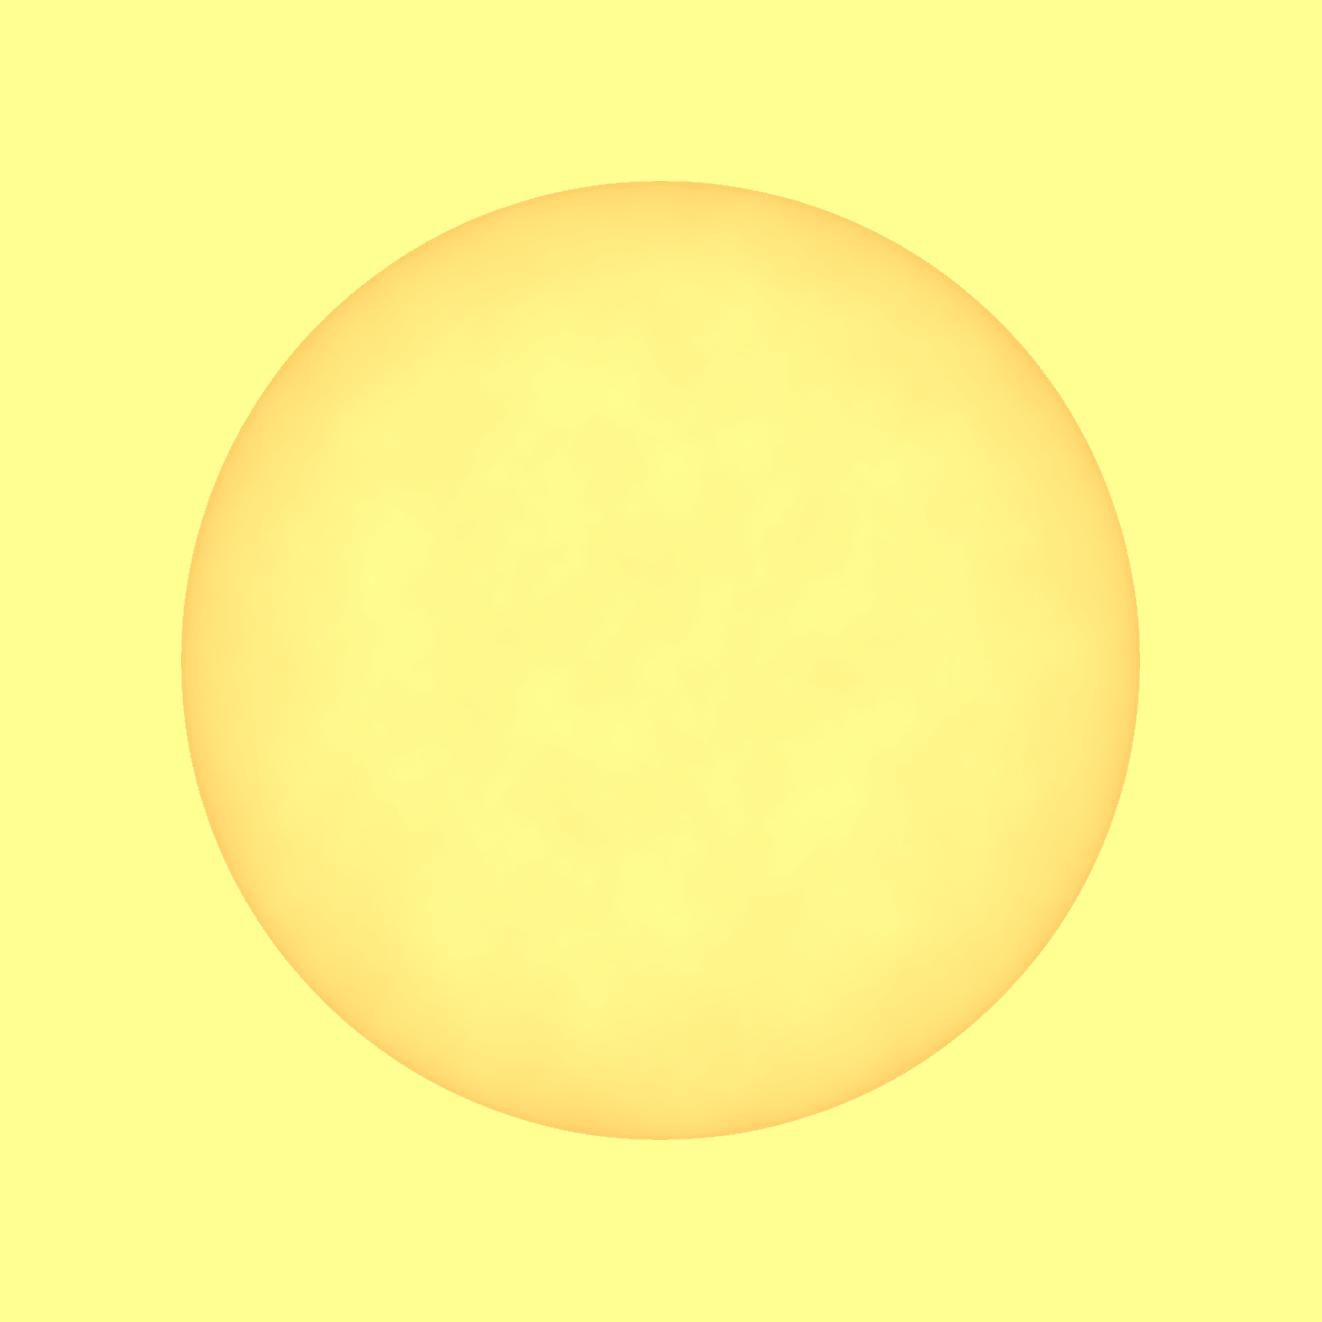 Faded sun clipart. Javascript how can i